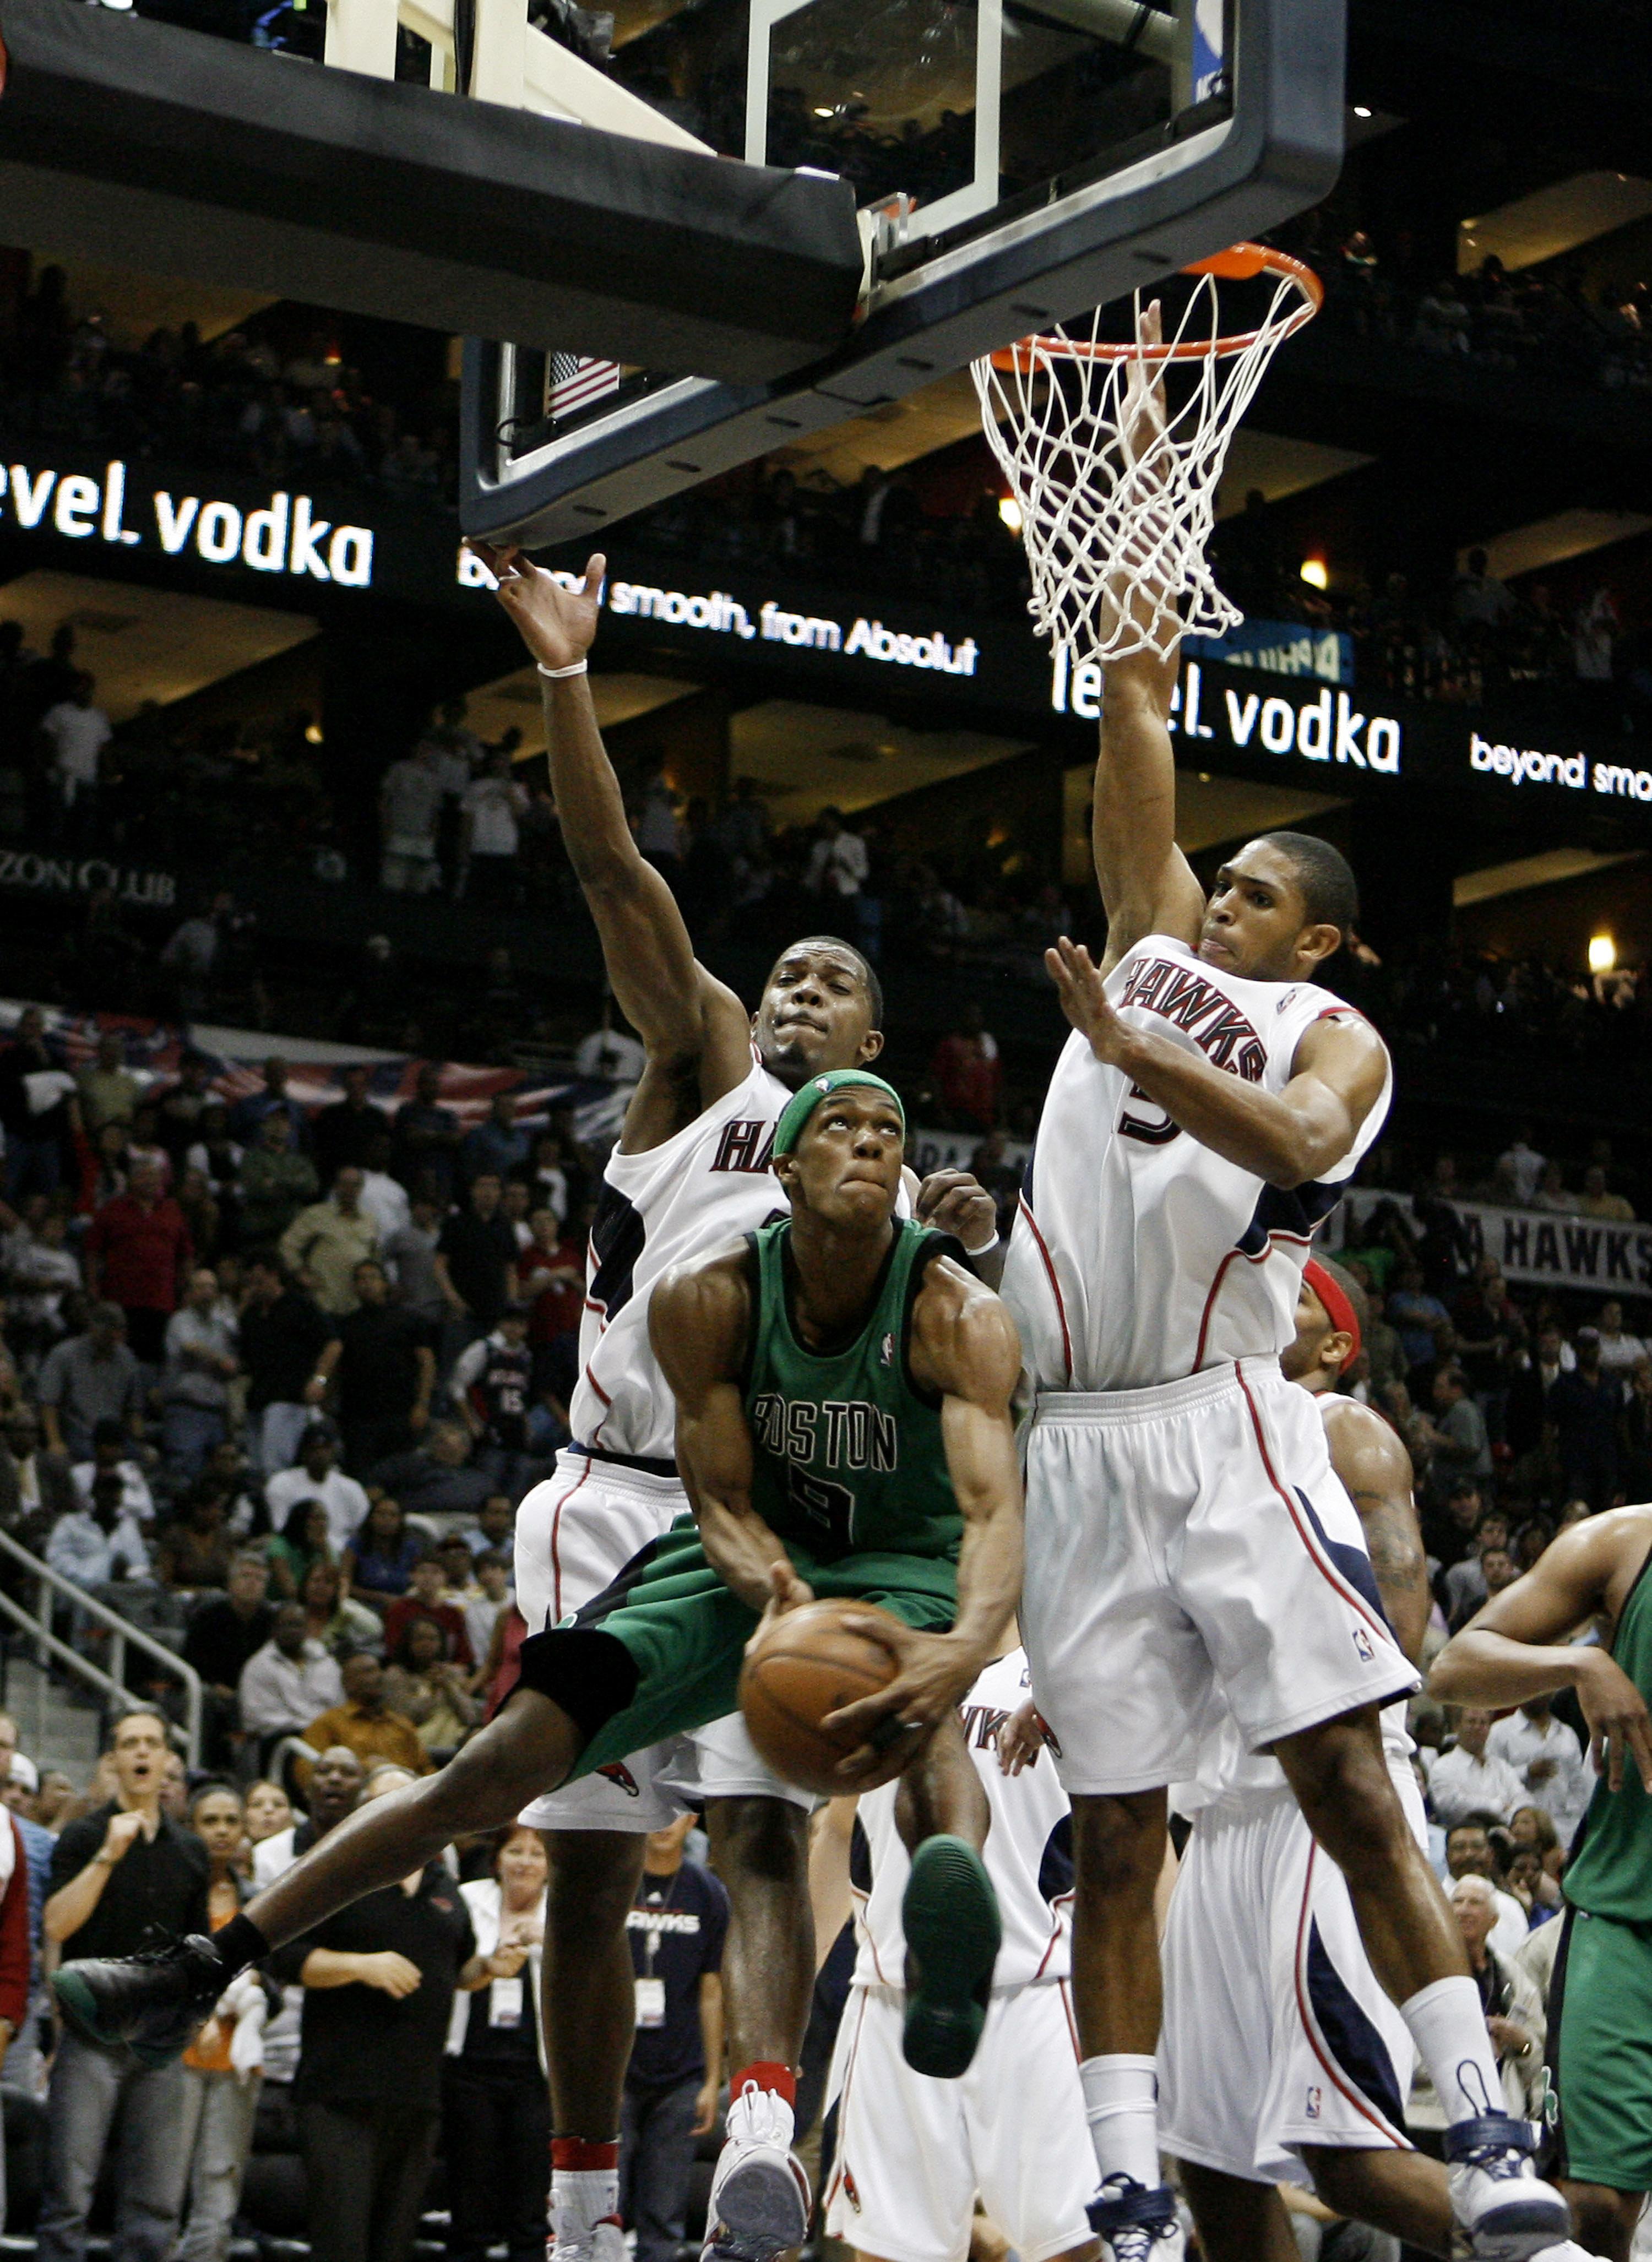 ATLANTA - APRIL 26:  Guard Rajon Rondo #9 of the Boston Celtics tries to score around defenders Al Horford #15 and Joe Johnson #2 of the Atlanta Hawks during Game Three of the Eastern Conference Quarterfinals against the Atlanta Hawks during the 2008 NBA